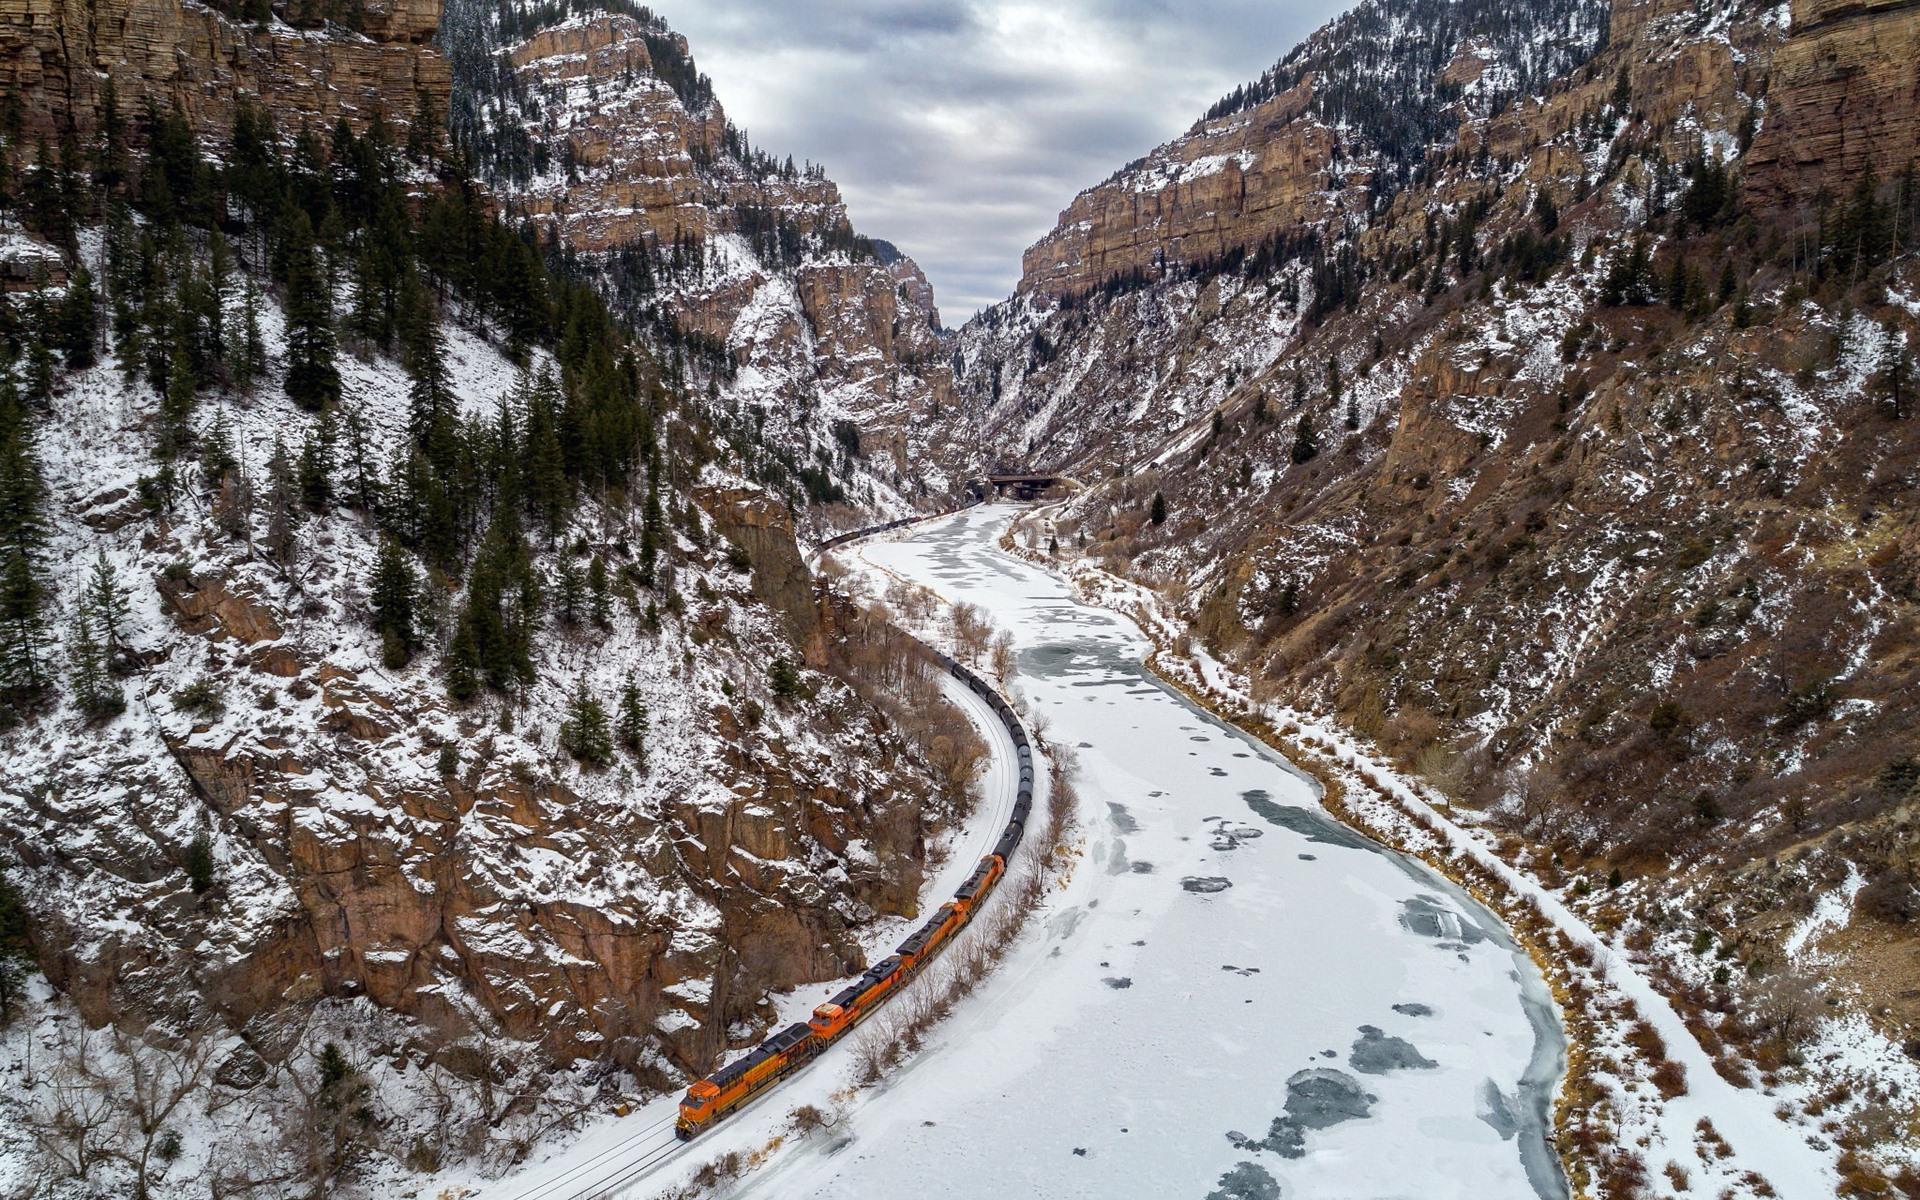 Fondo De Montañas Nevadas En Hd: Fondos De Pantalla Montañas, Nieve, Río, Ferrocarril